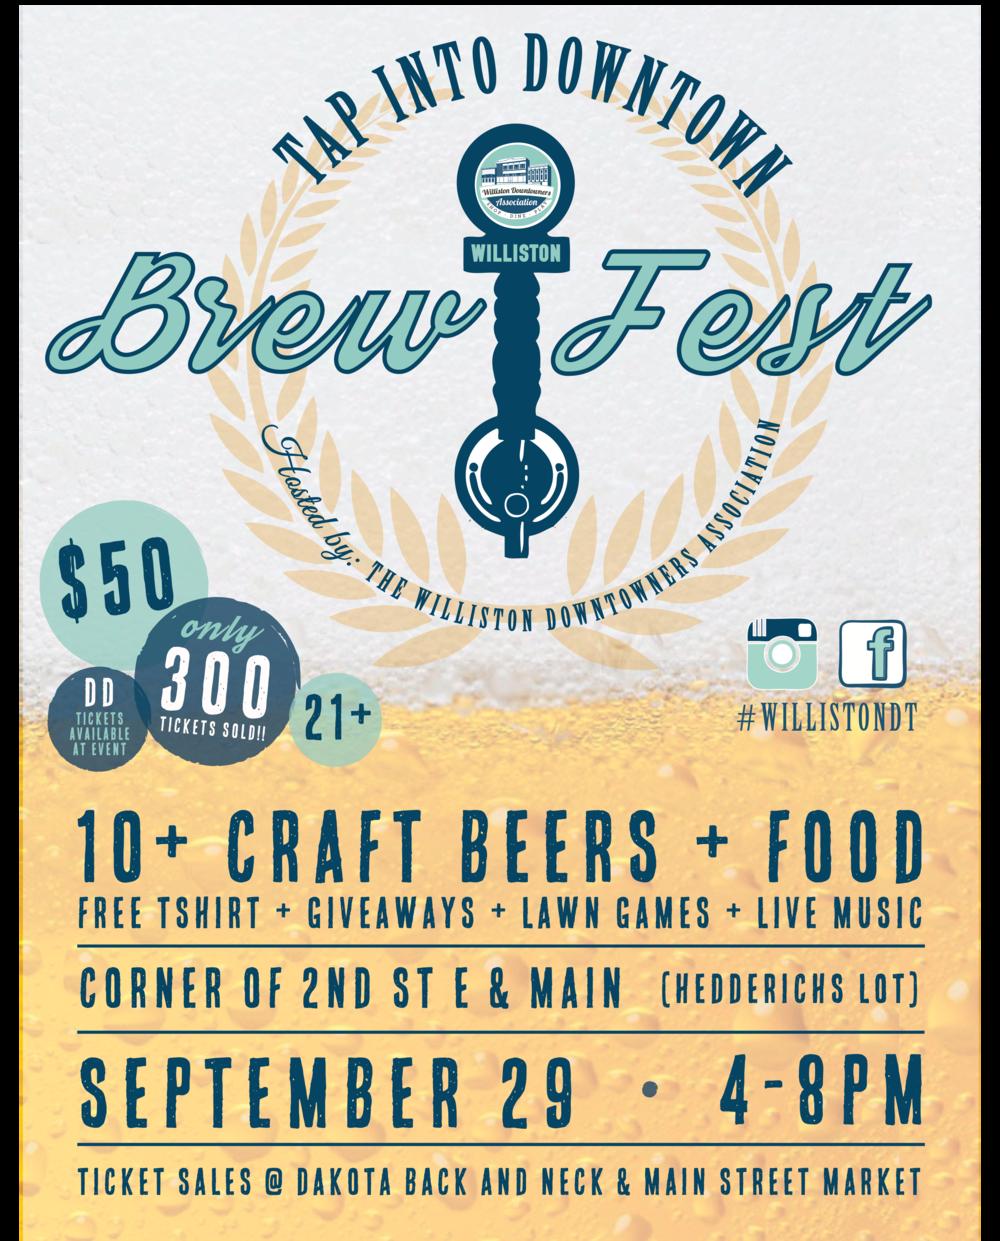 BrewfestFlyer (4).png